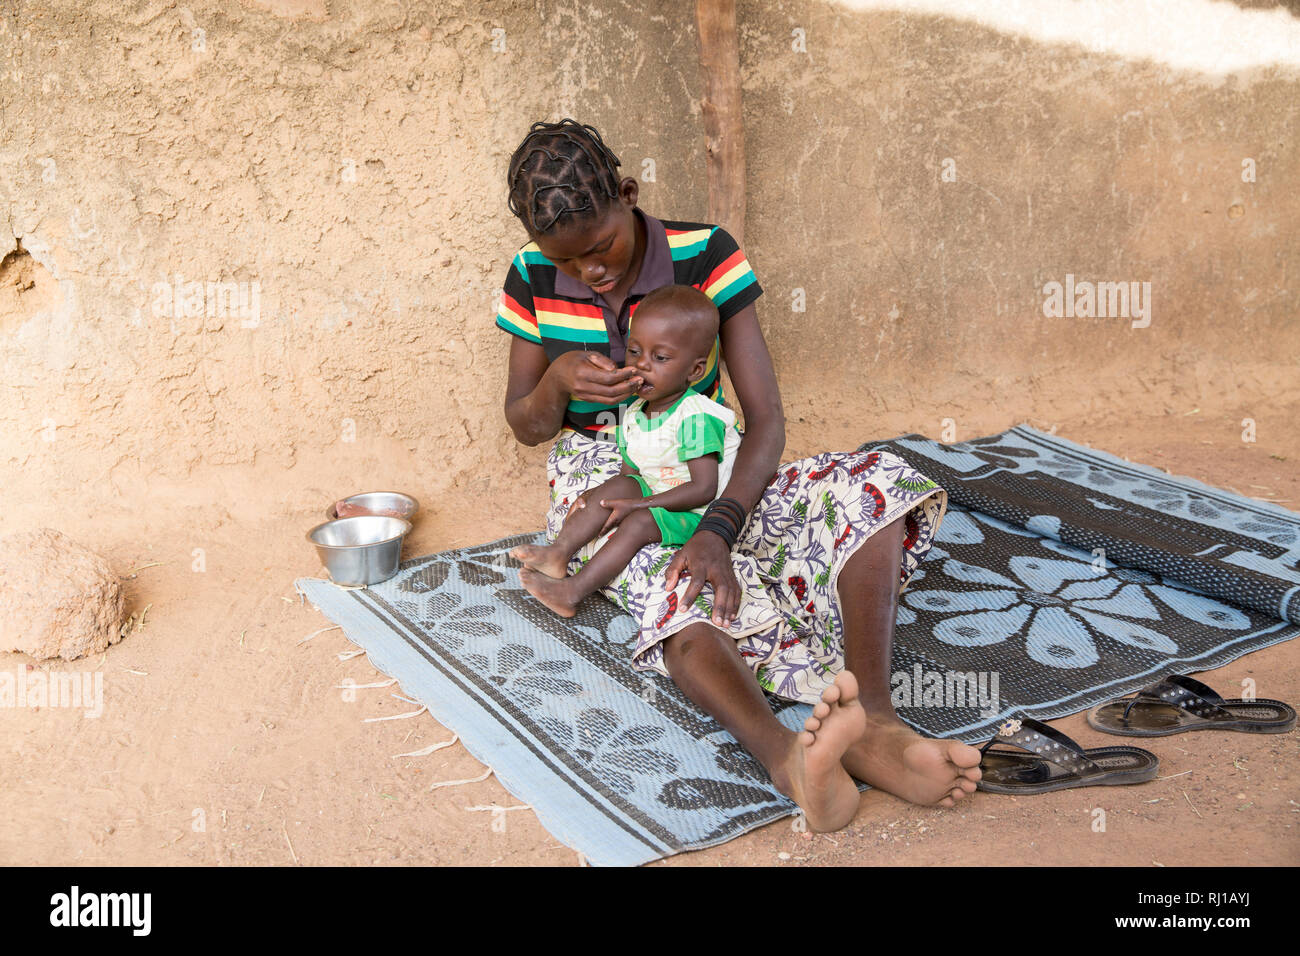 Samba village, Yako Province, Burkina Faso: Abzetta Sondo, 19, and her child Noel Nougtara, 15 months. Her baby is suffering from acute malnutrition. Stock Photo